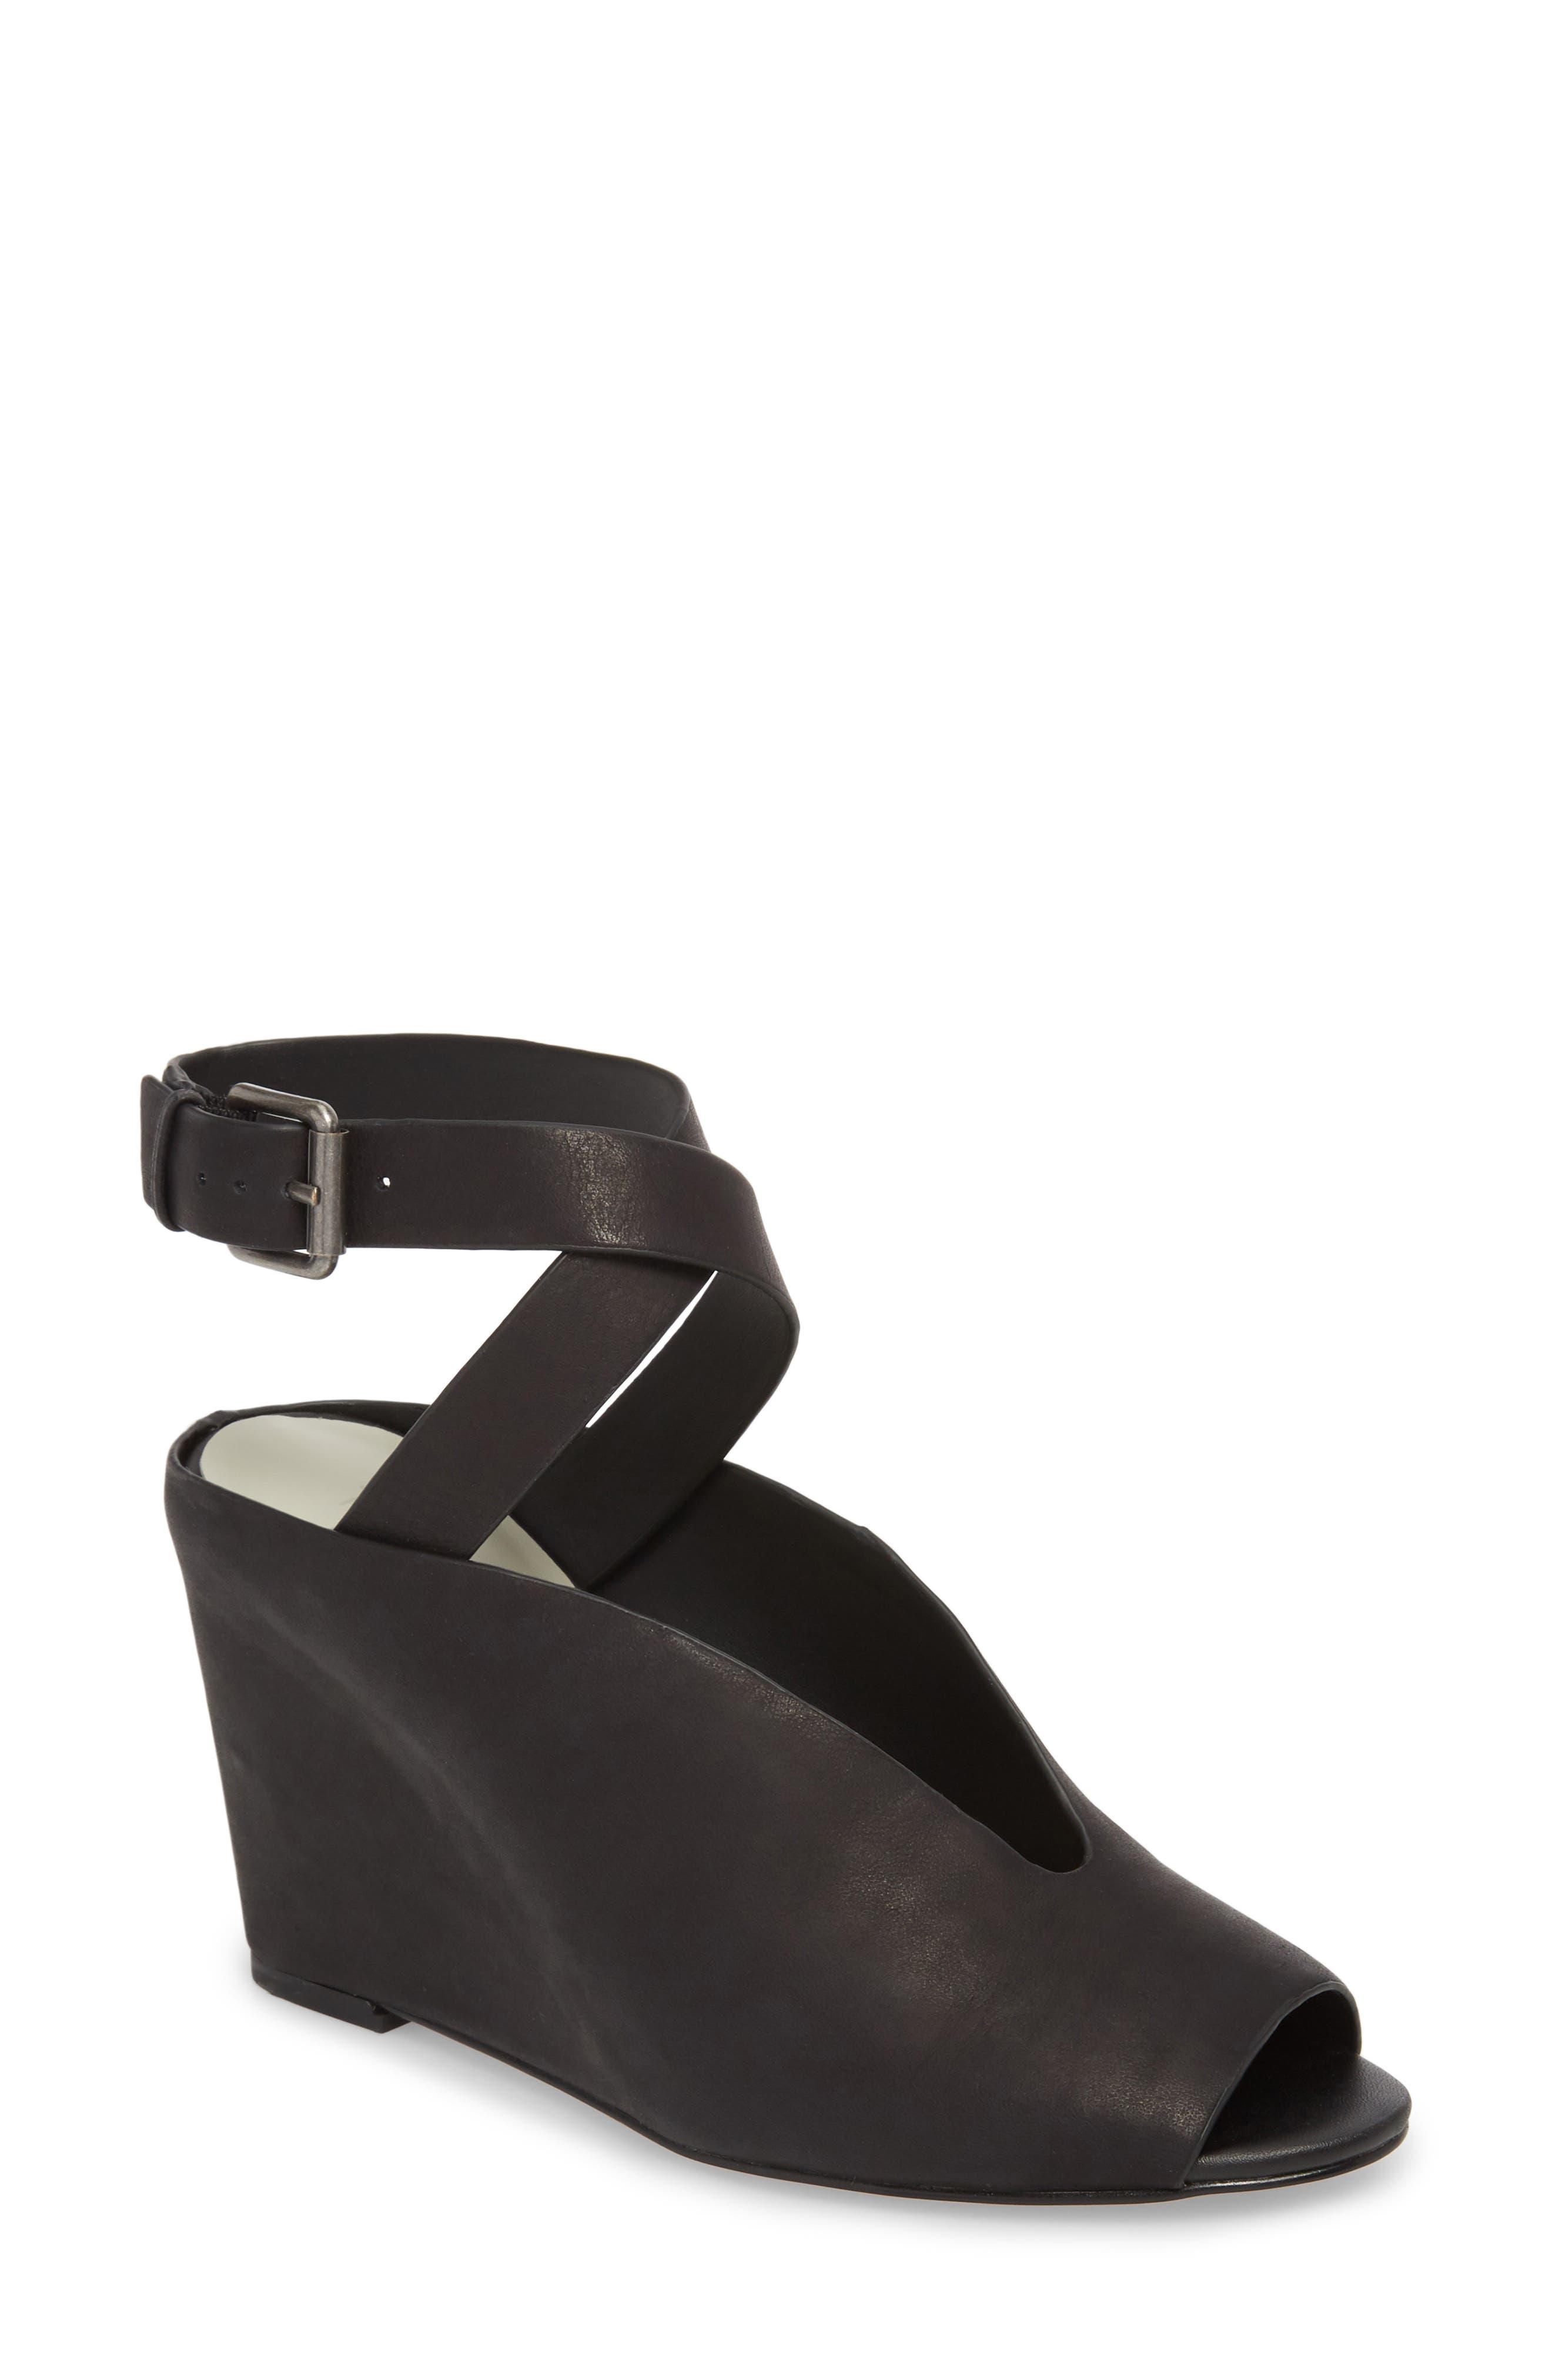 Felidia Wedge Sandal,                             Main thumbnail 1, color,                             Black Leather